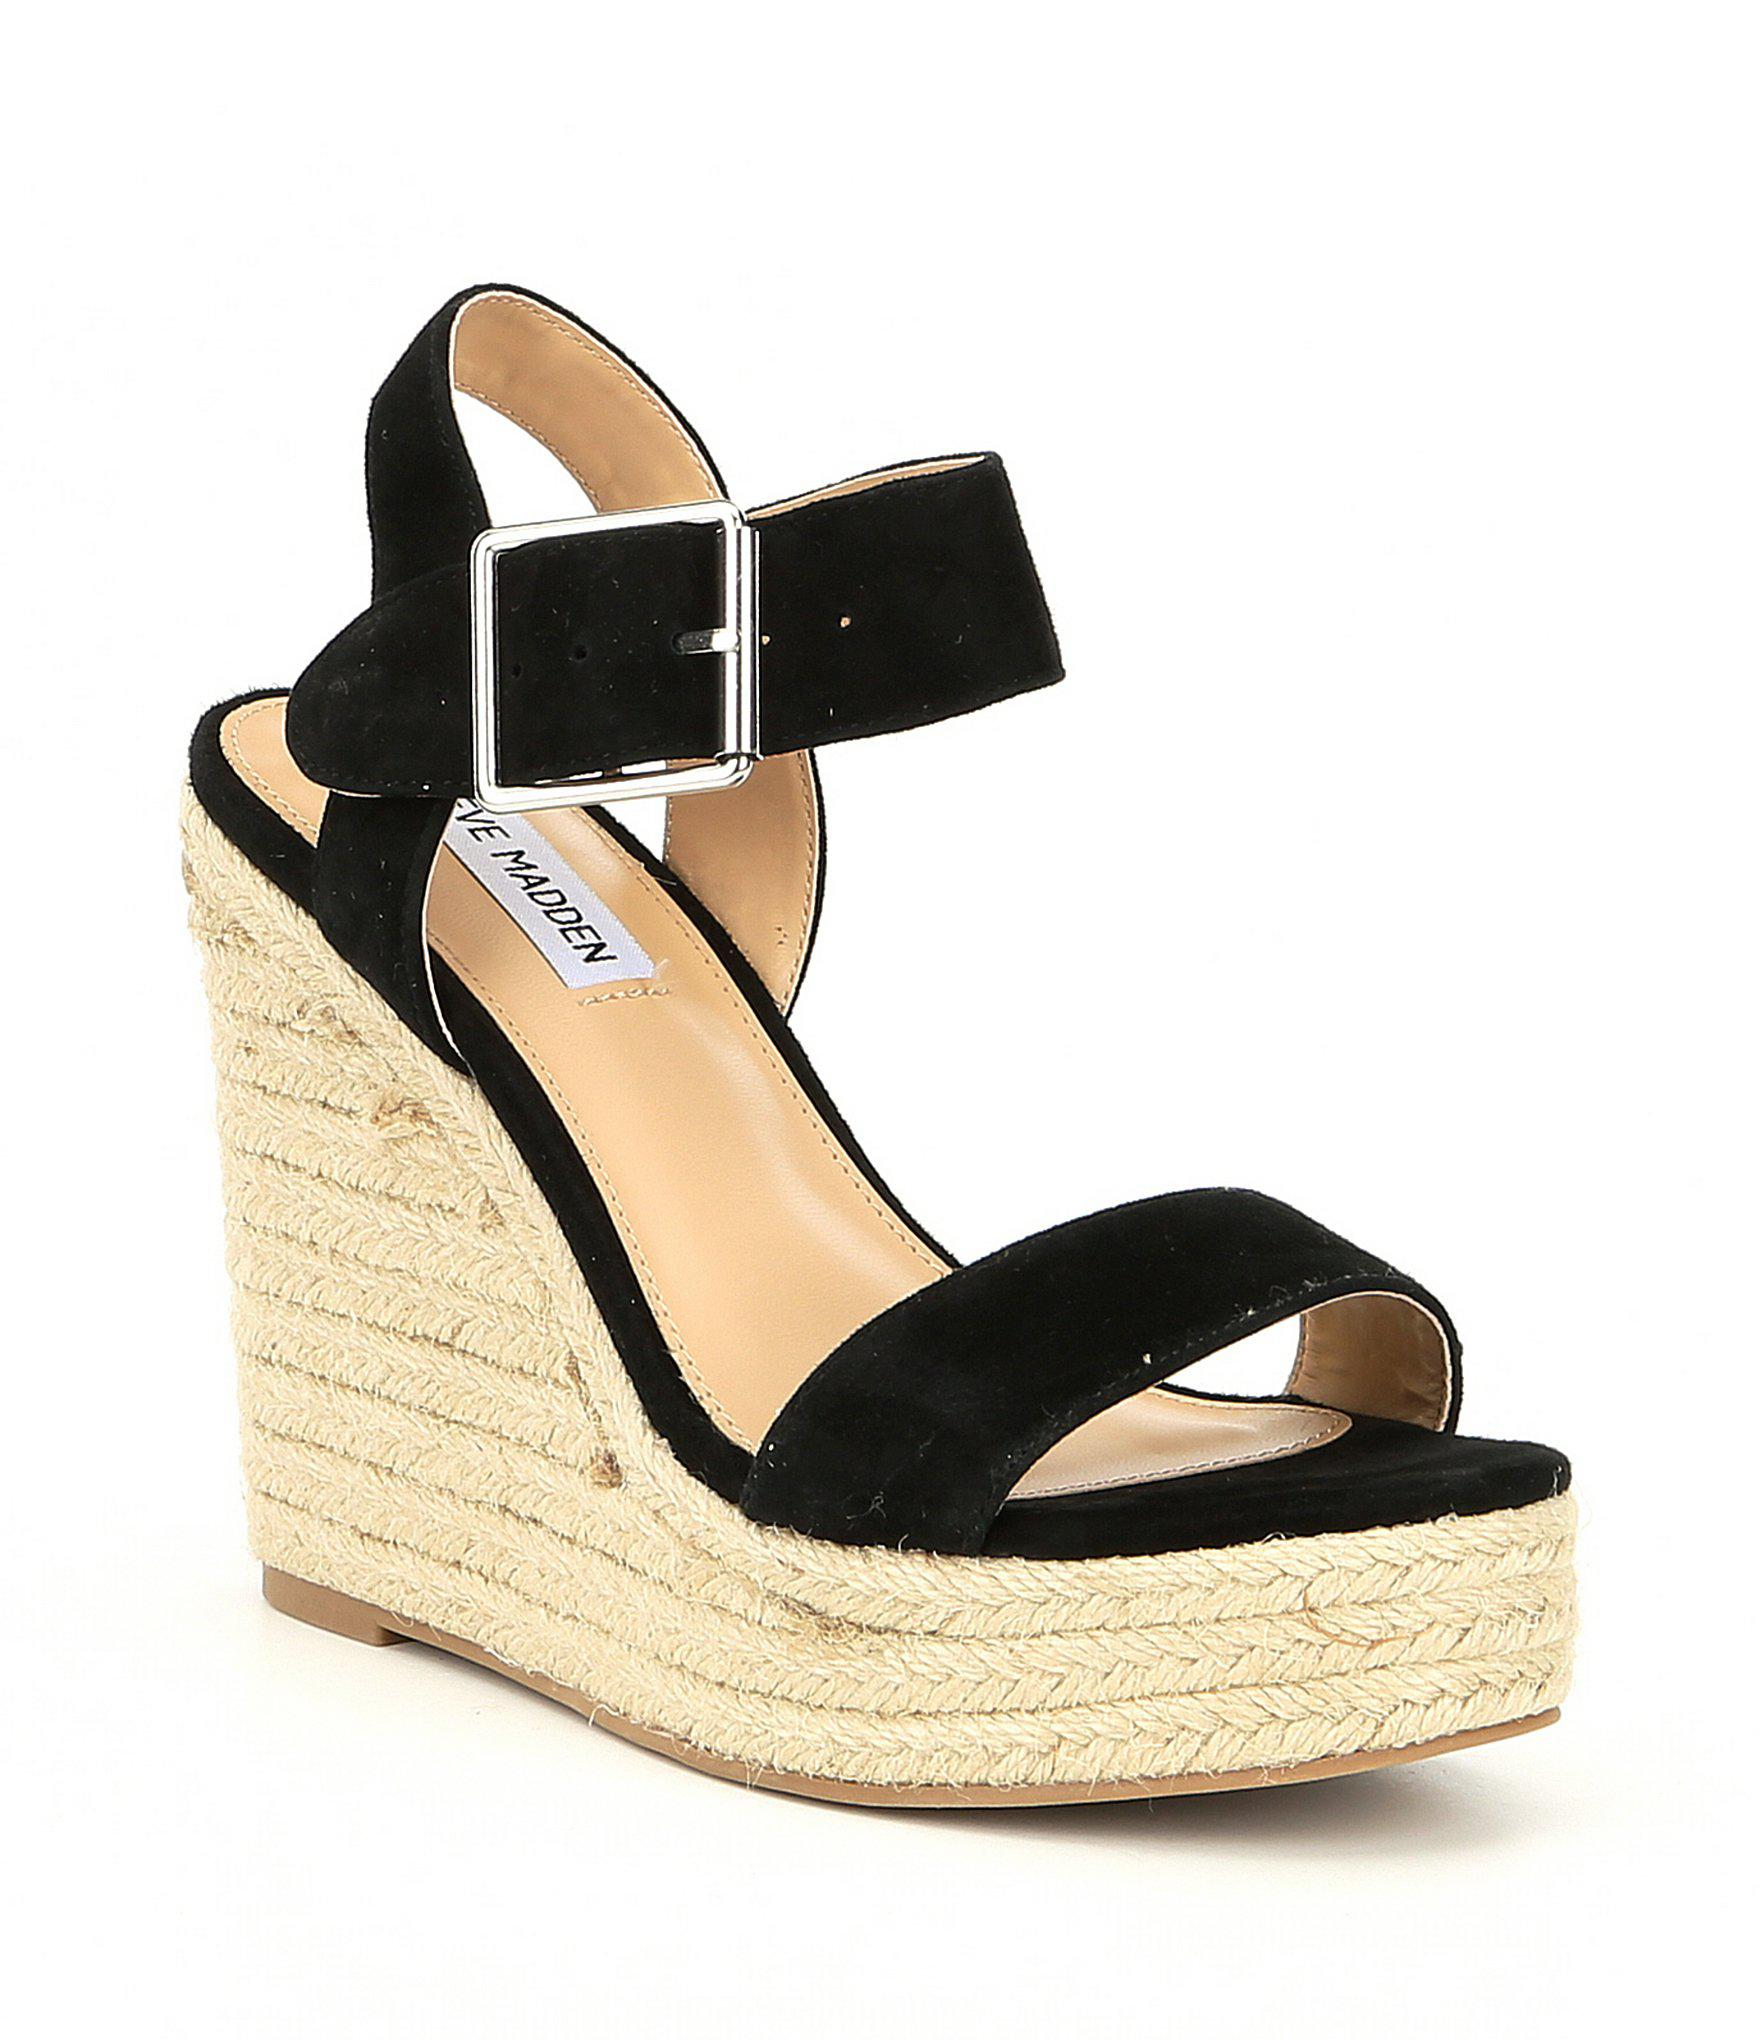 570cd1eb13d Steve Madden Santorini Suede Espadrille Wedge Sandals in Black - Lyst